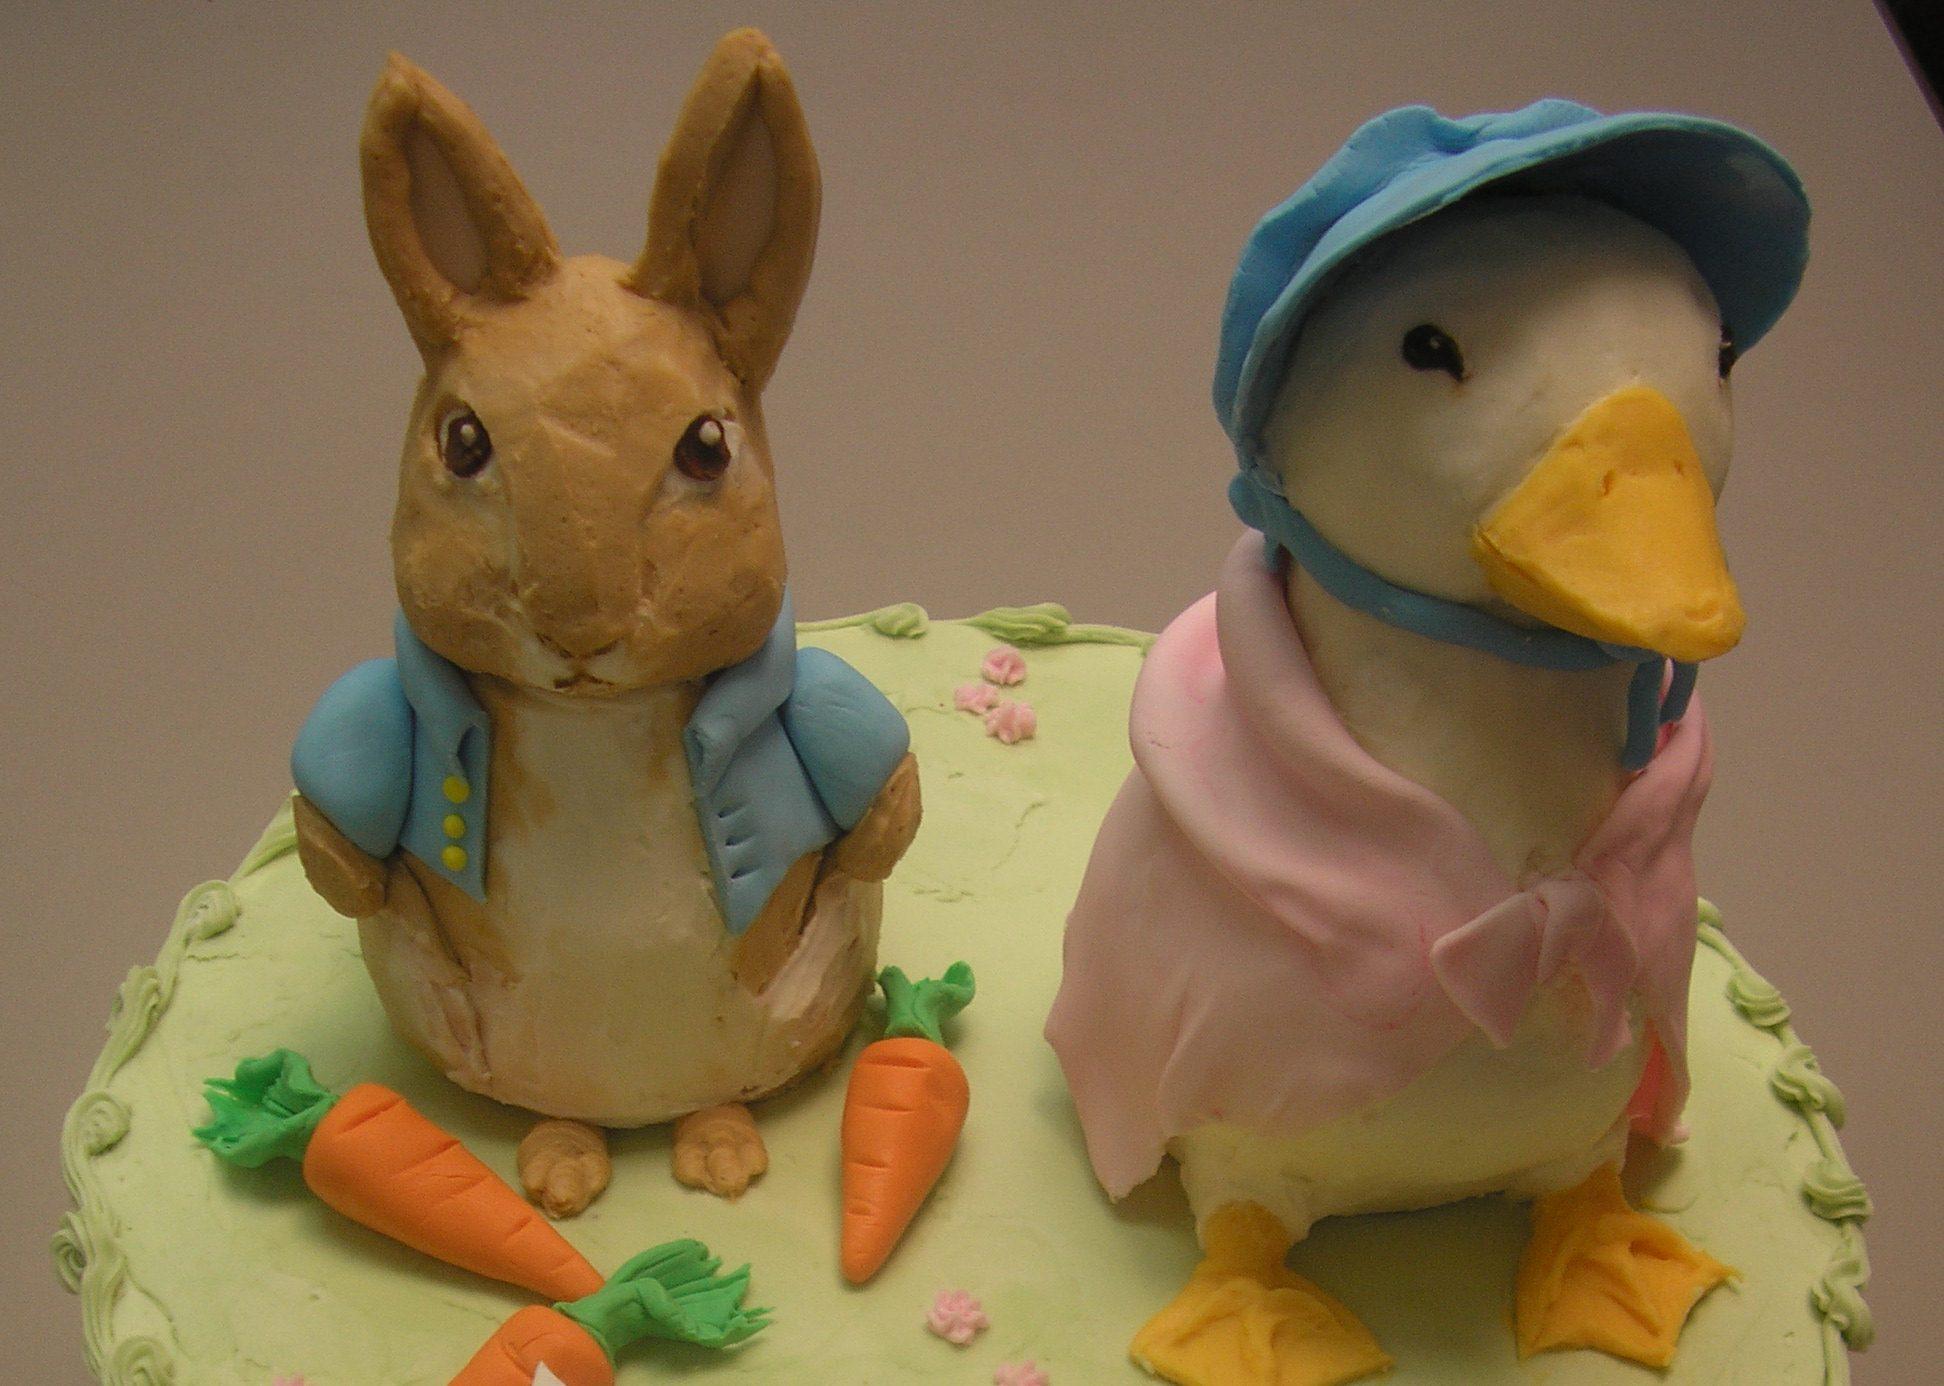 Beatrix potter cake, rabbit cake, duck cake